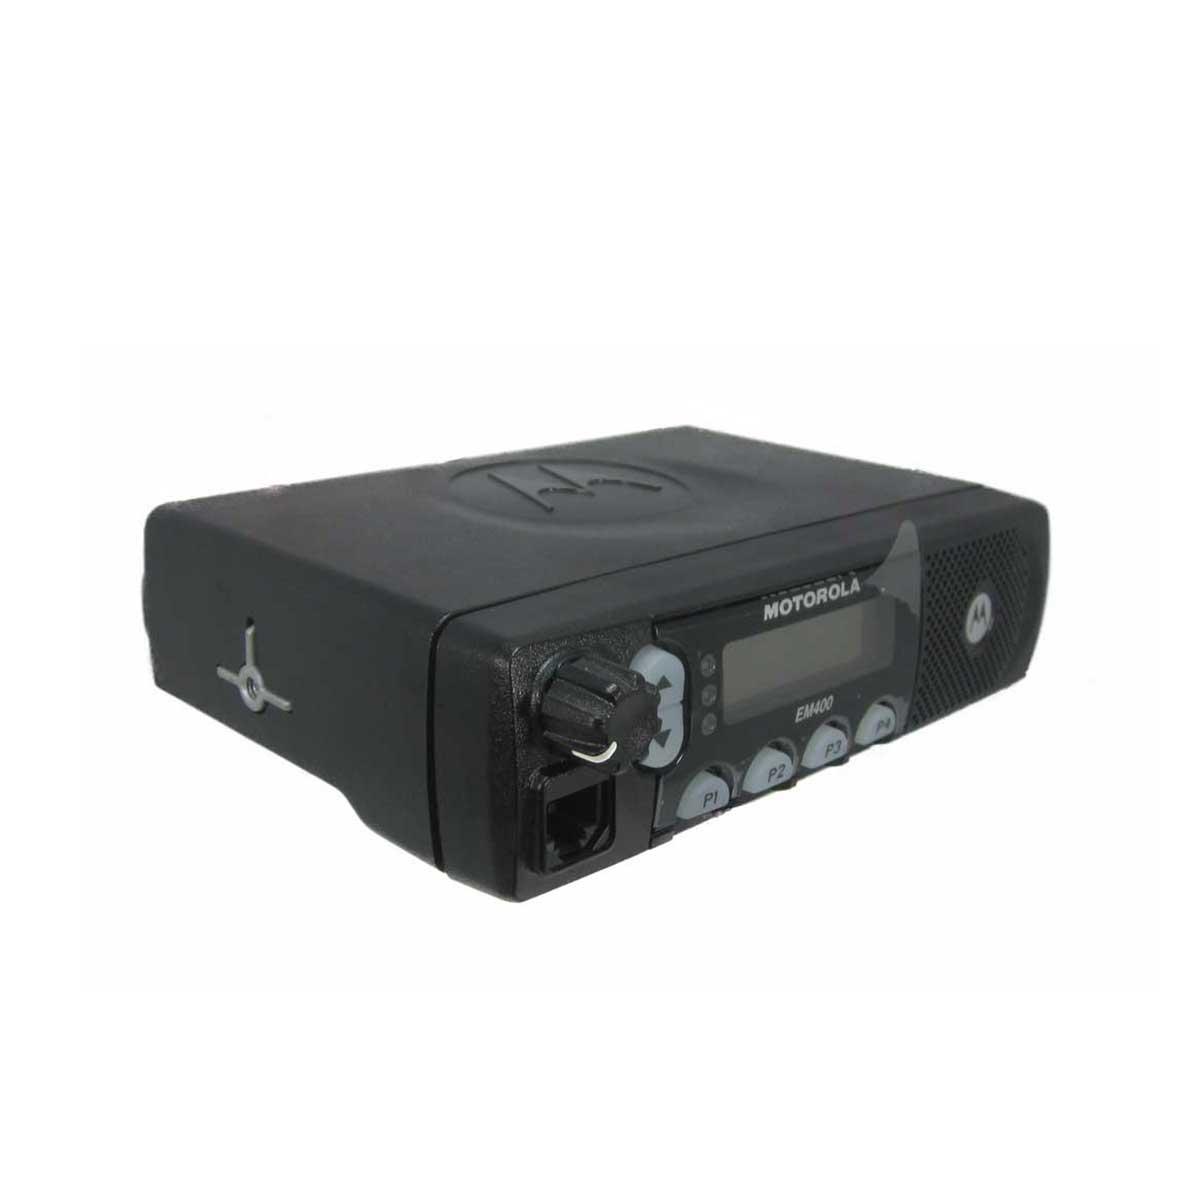 Radio Motorola EM400 Analógico LAM50QNF9AA1AN UHF 403-440 MHz